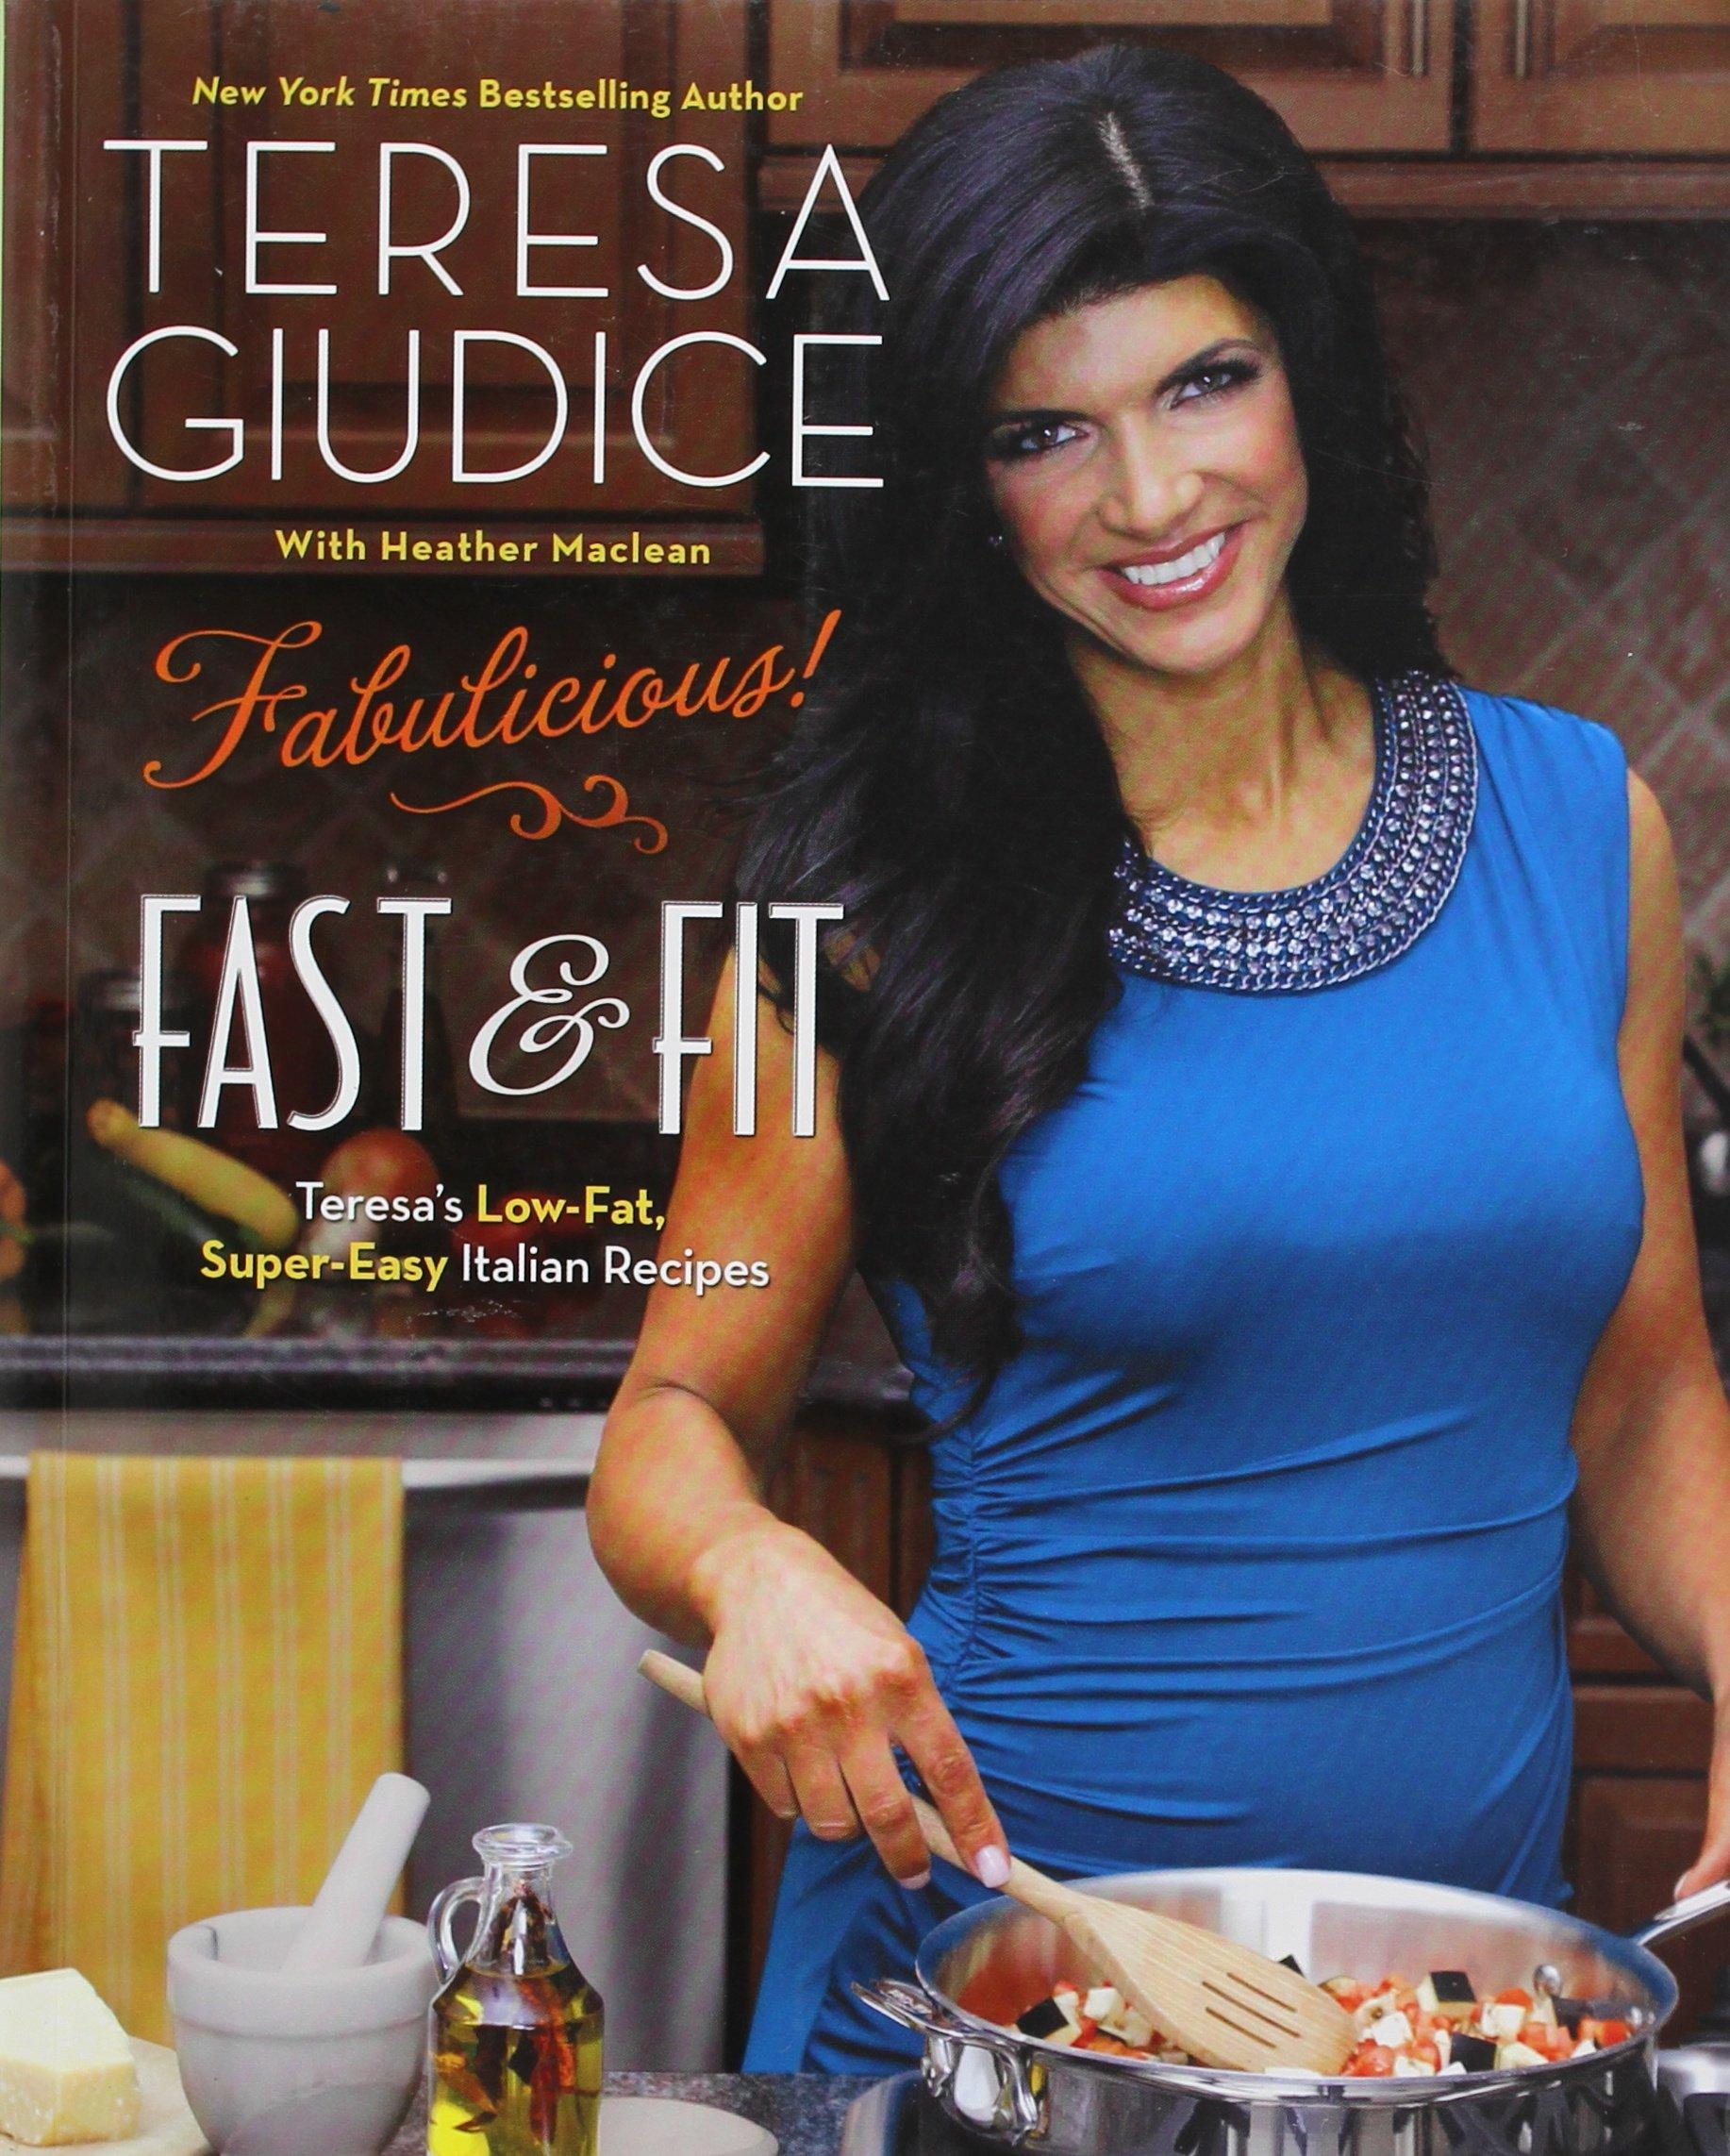 Fabulicious!: Fast & Fit: Teresa's Low-Fat, Super-Easy Italian Recipes:  Teresa Giudice, Heather Maclean: 8601400238950: Amazon.com: Books